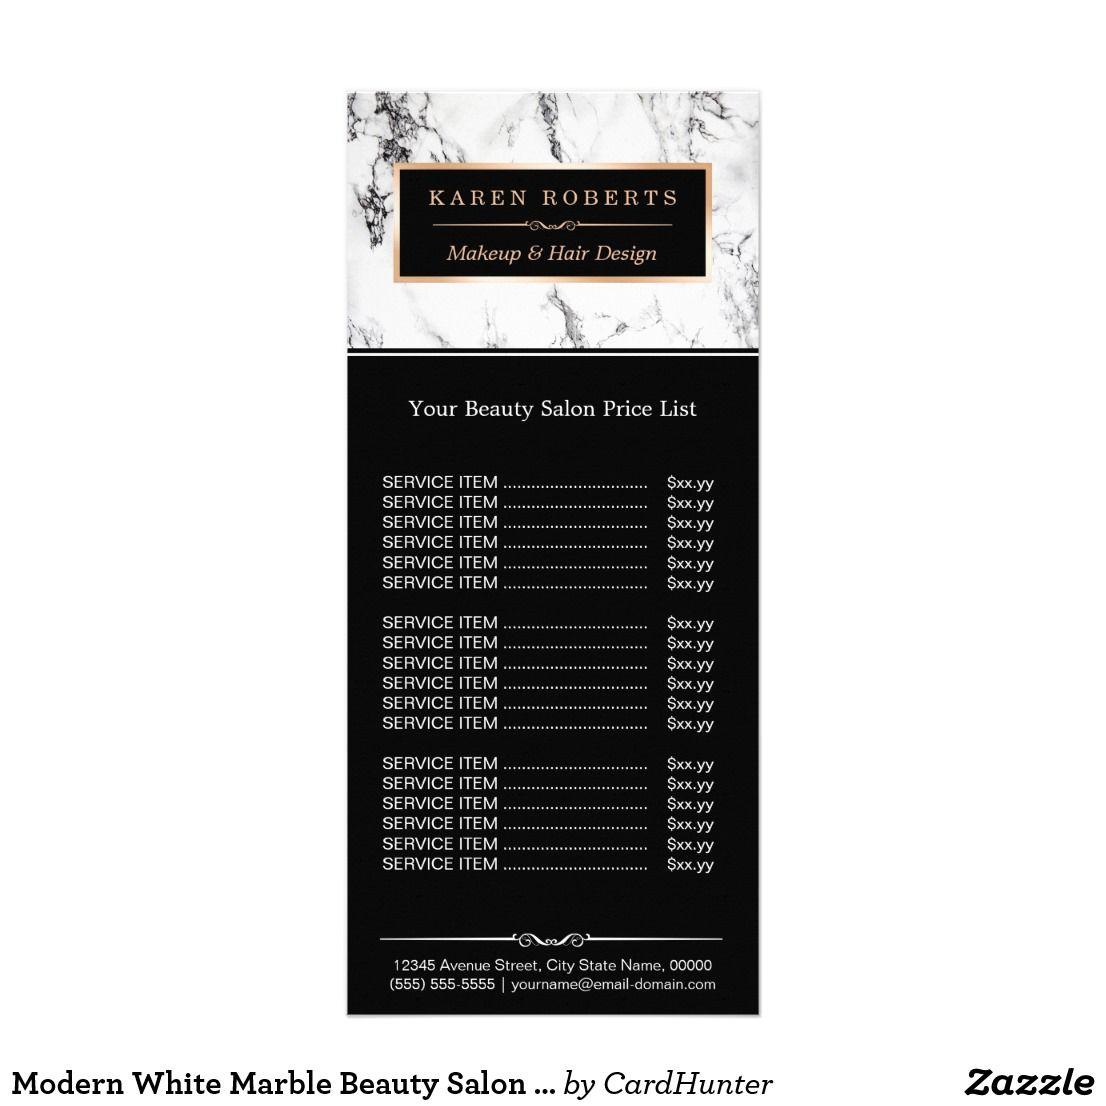 Modern White Marble Beauty Salon Price List Rack Card Zazzle Com Beauty Salon Price List Salon Price List Beauty Salon